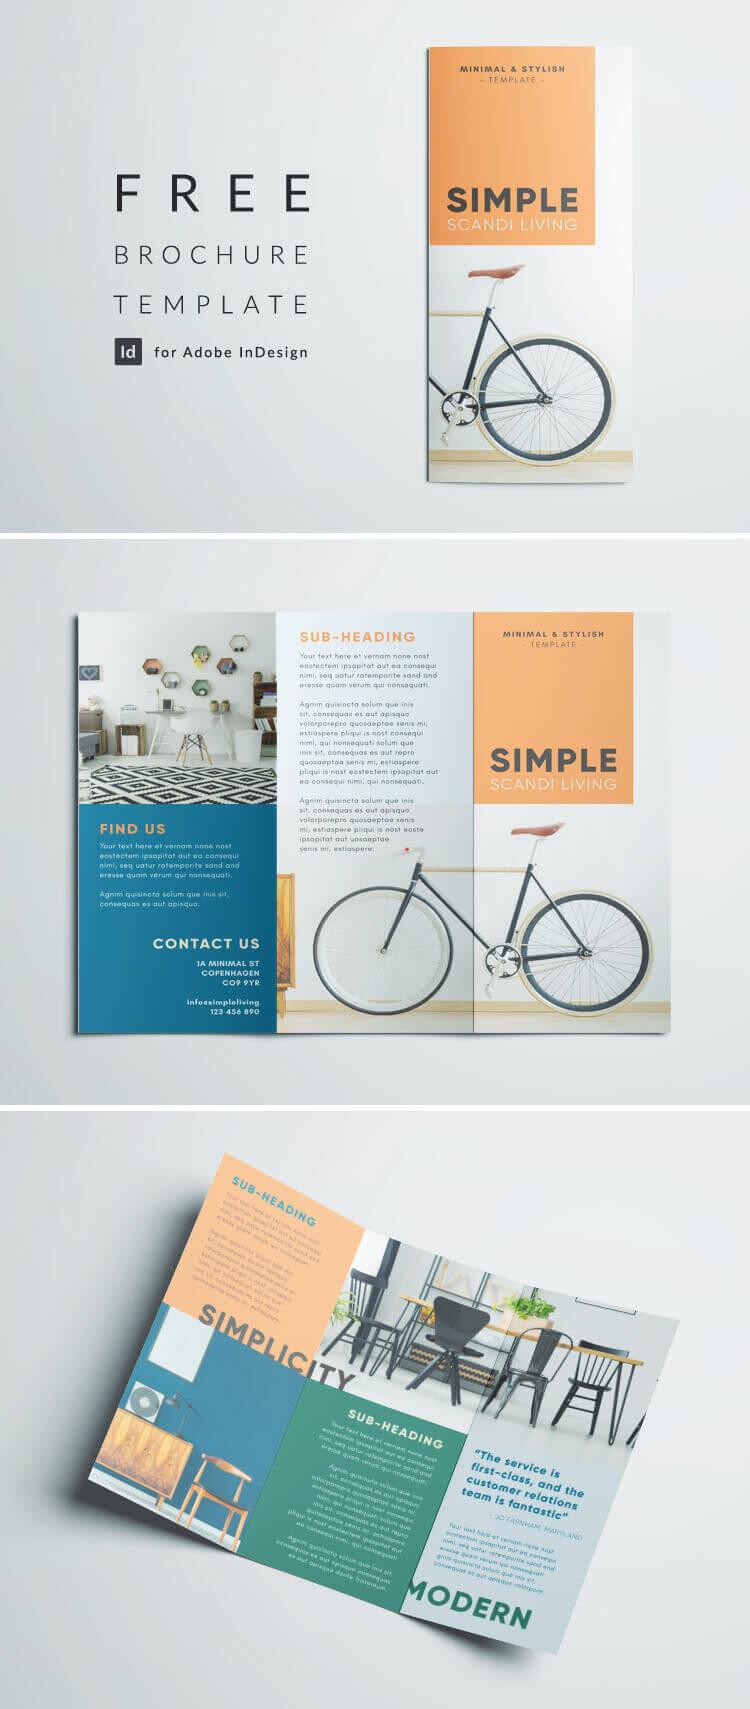 Simple Tri Fold Brochure | Free Indesign Template With Indesign Templates Free Download Brochure